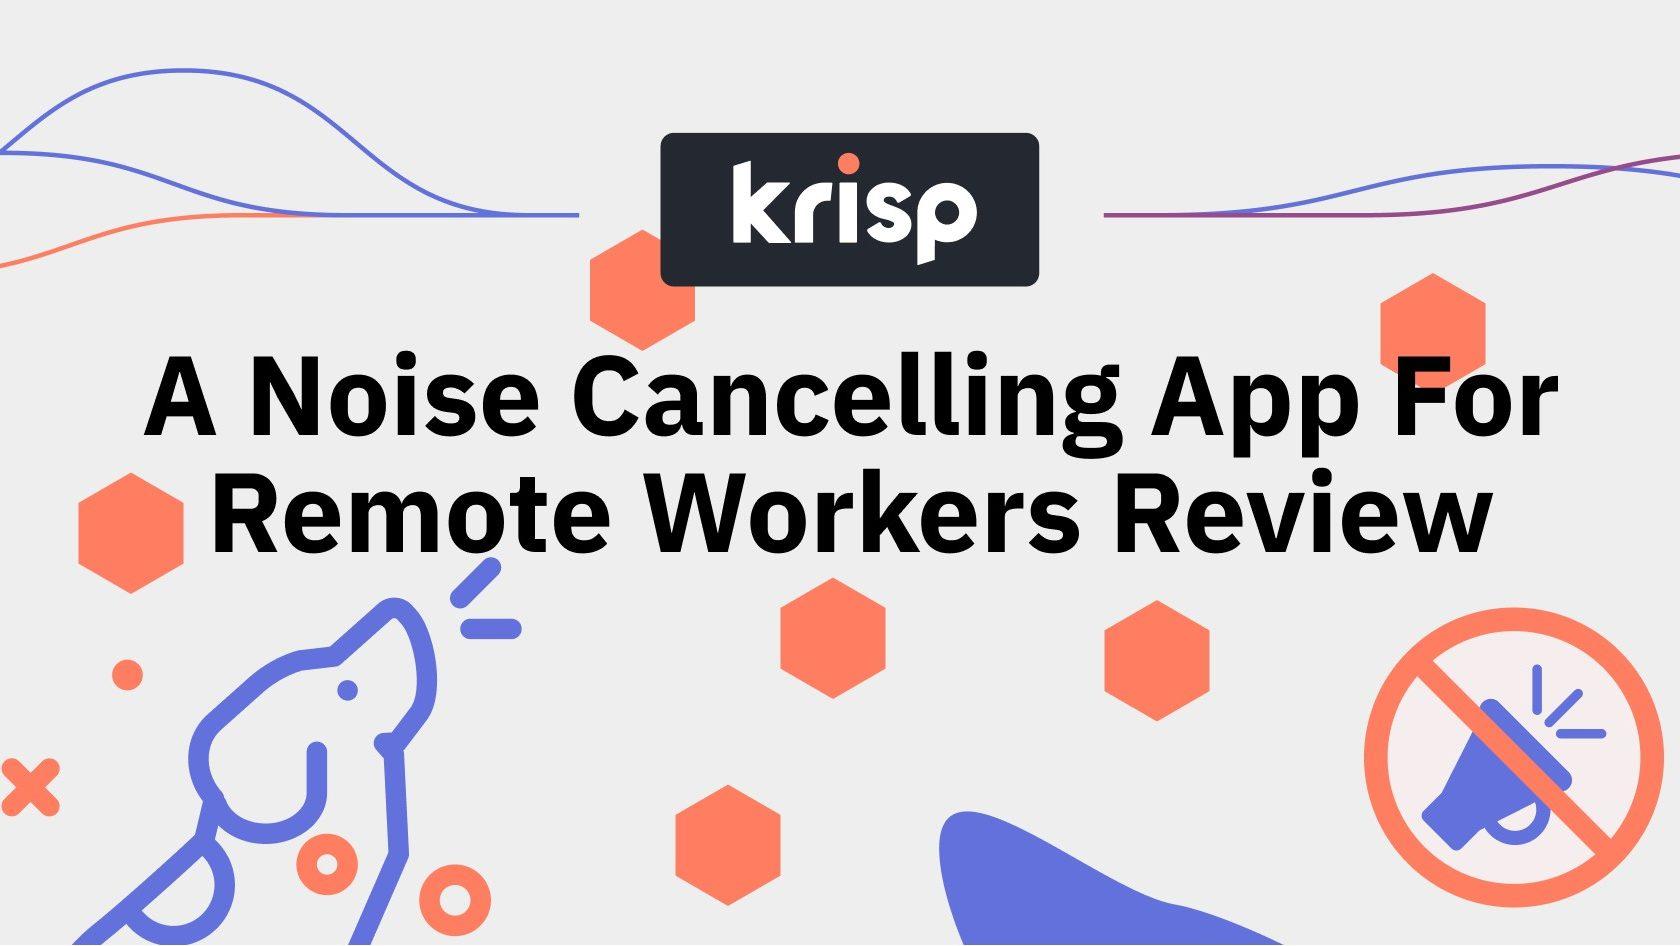 نرم افزار Krisp